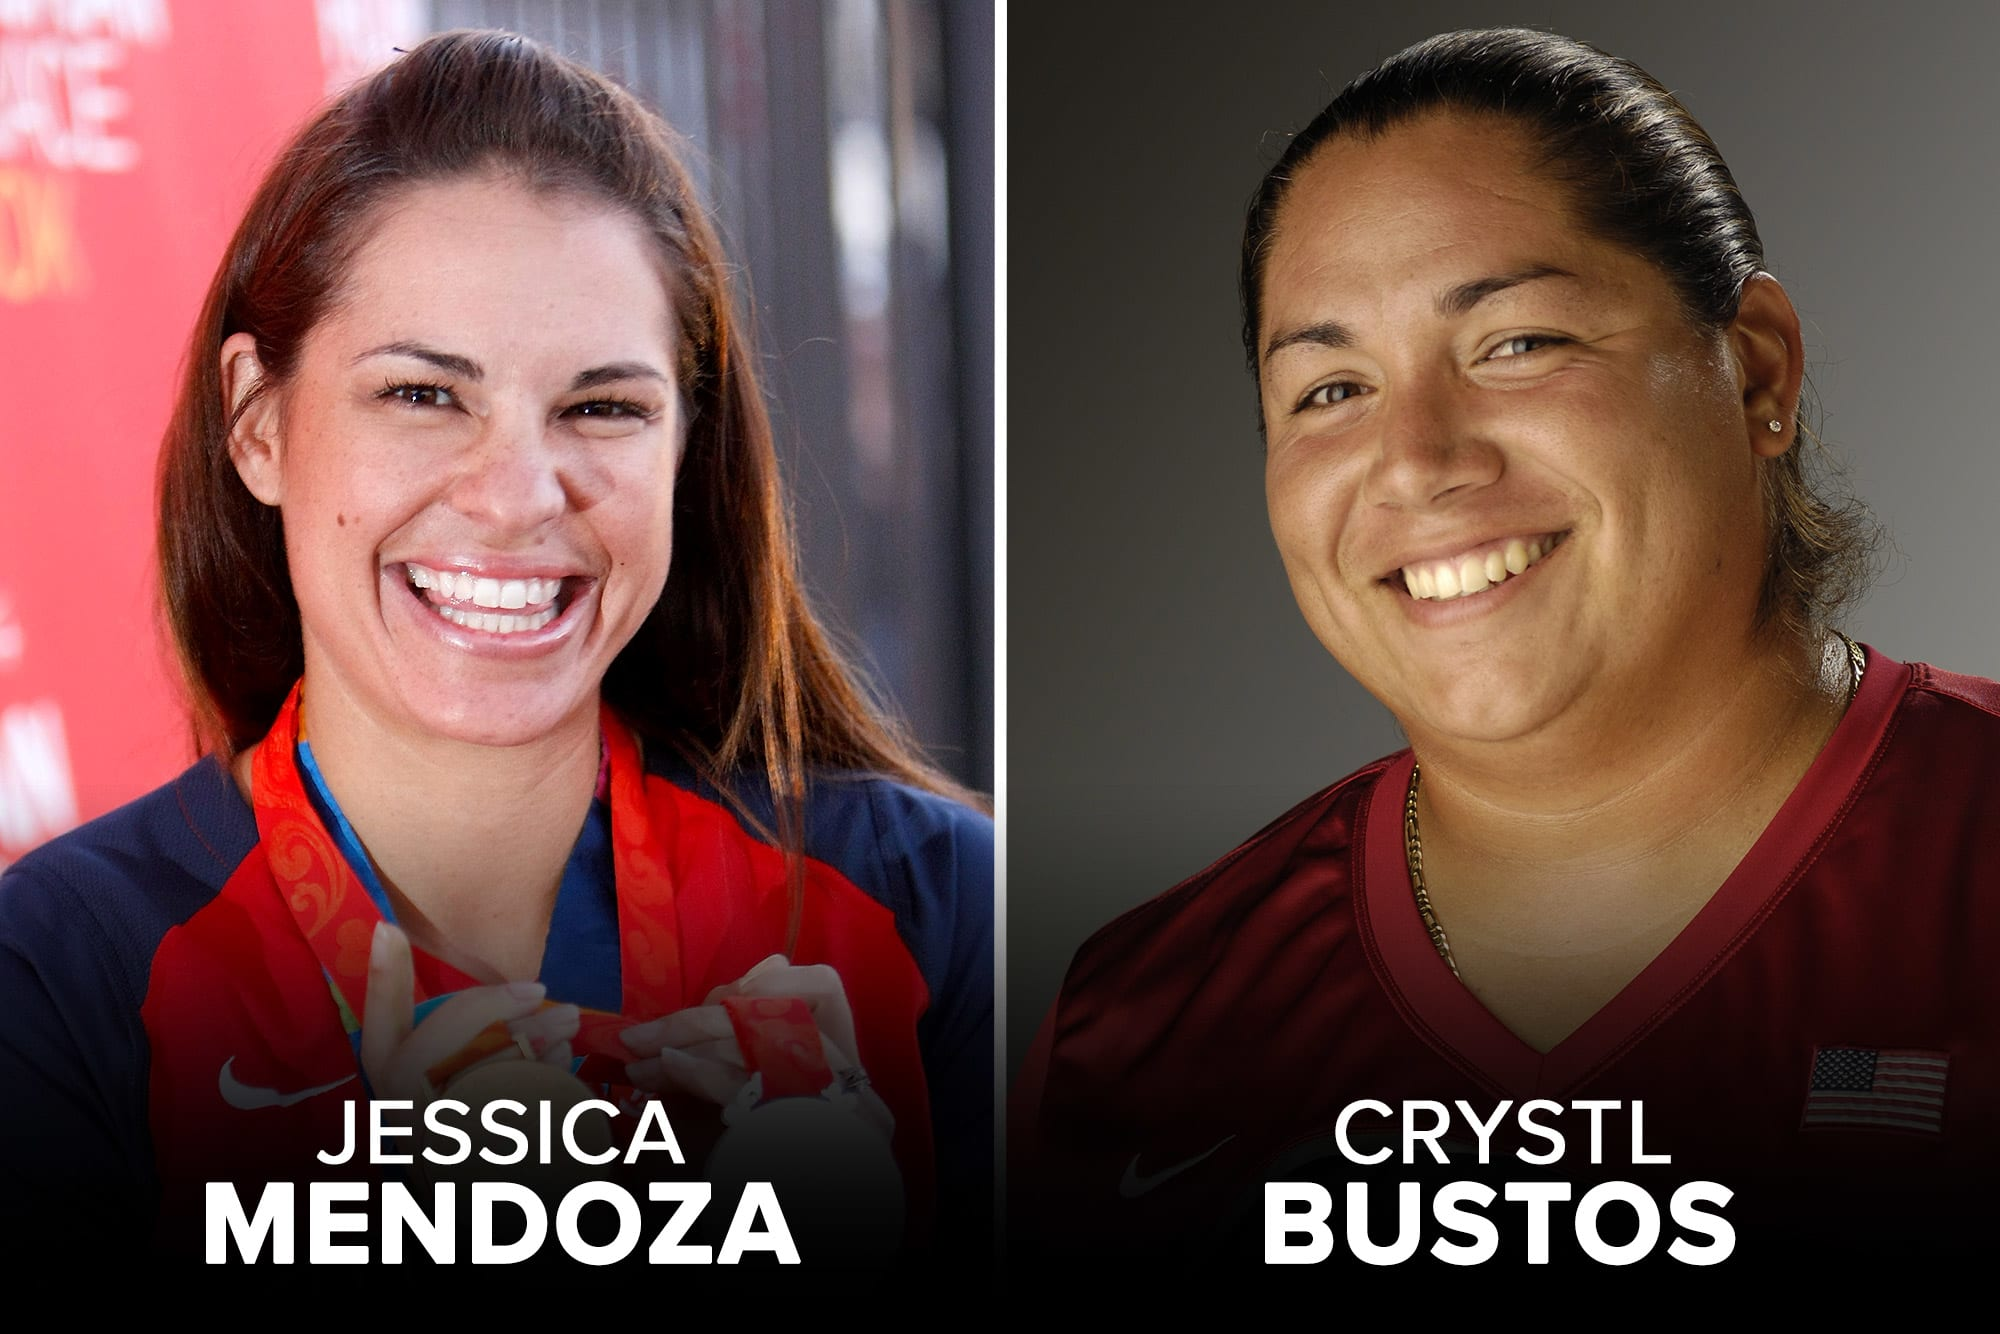 Jessica Mendoza and Crystl Bustos